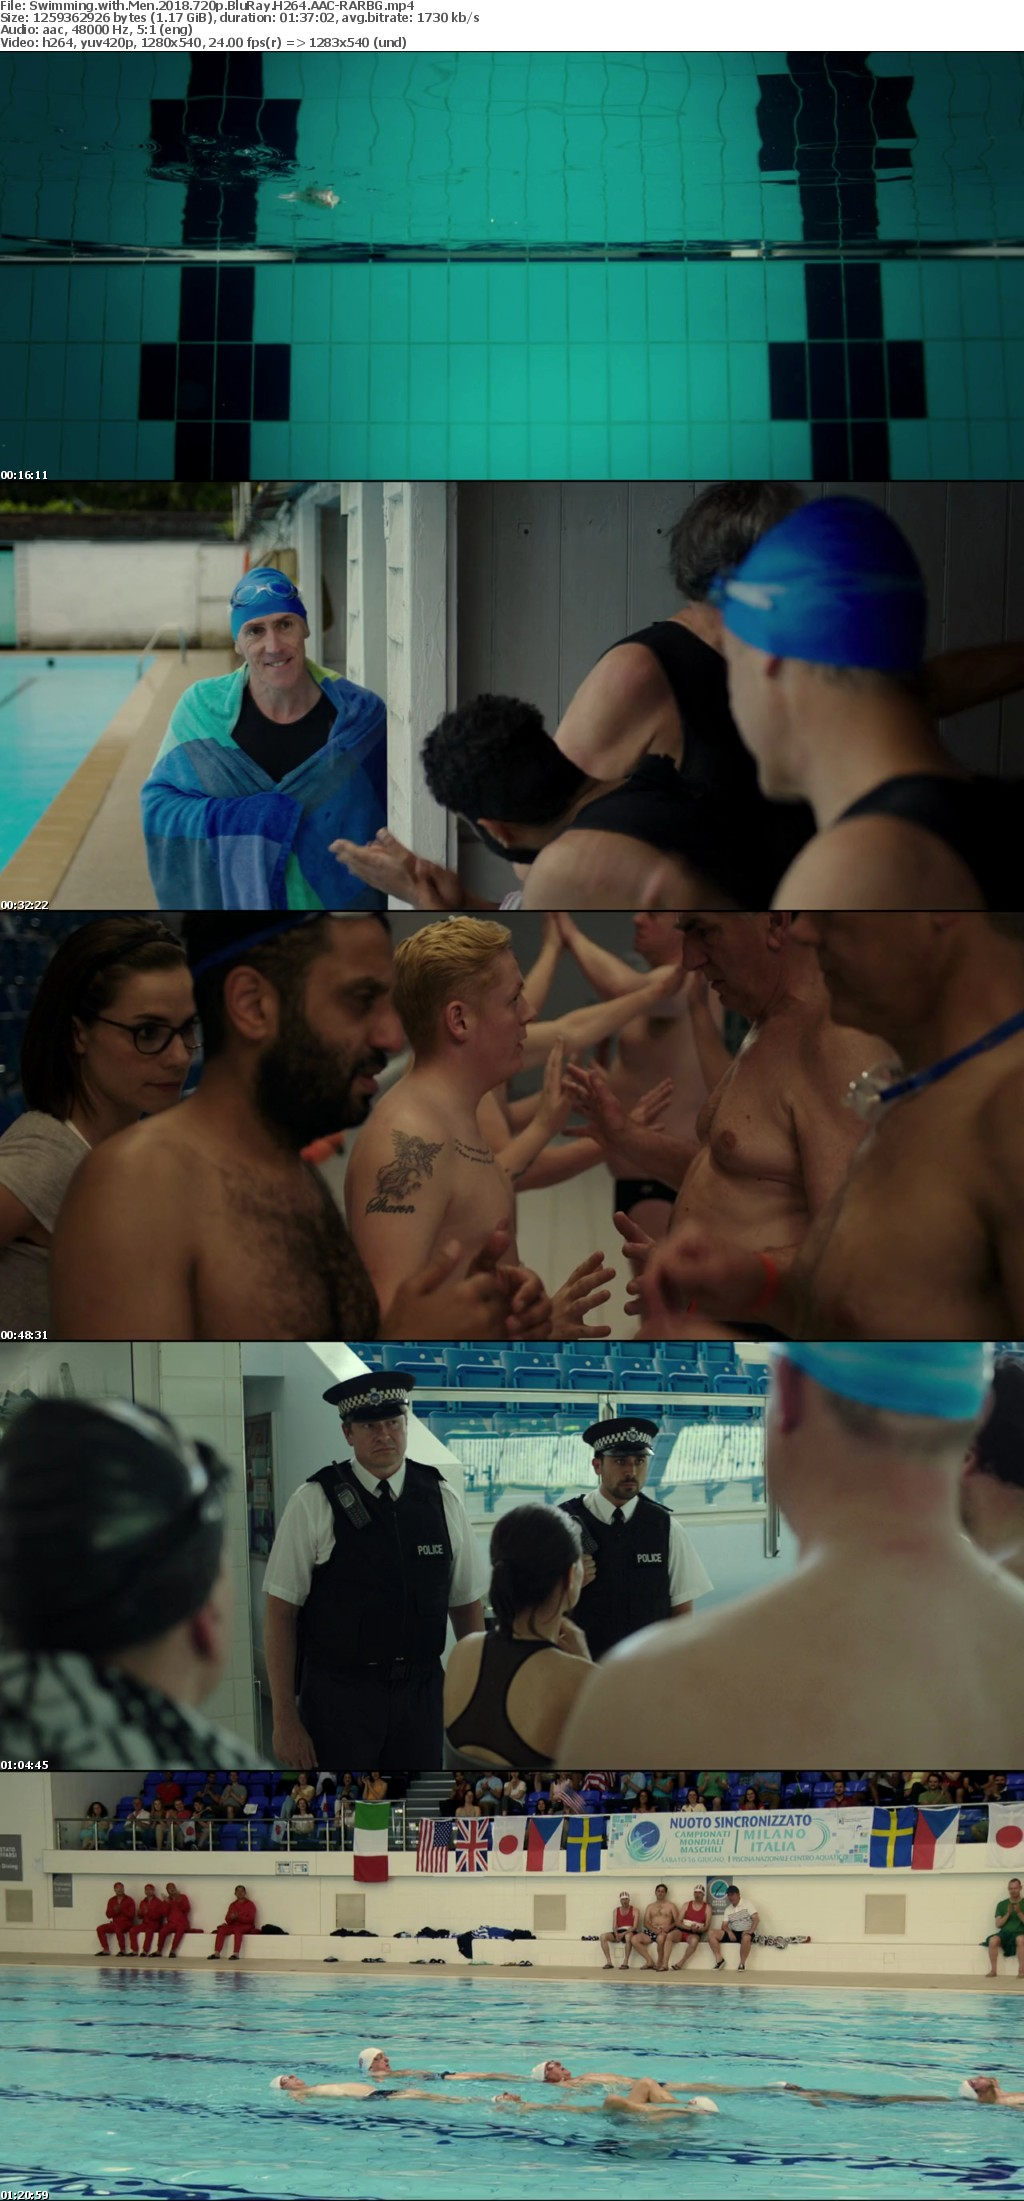 Swimming with Men 2018 720p BluRay H264 AAC-RARBG